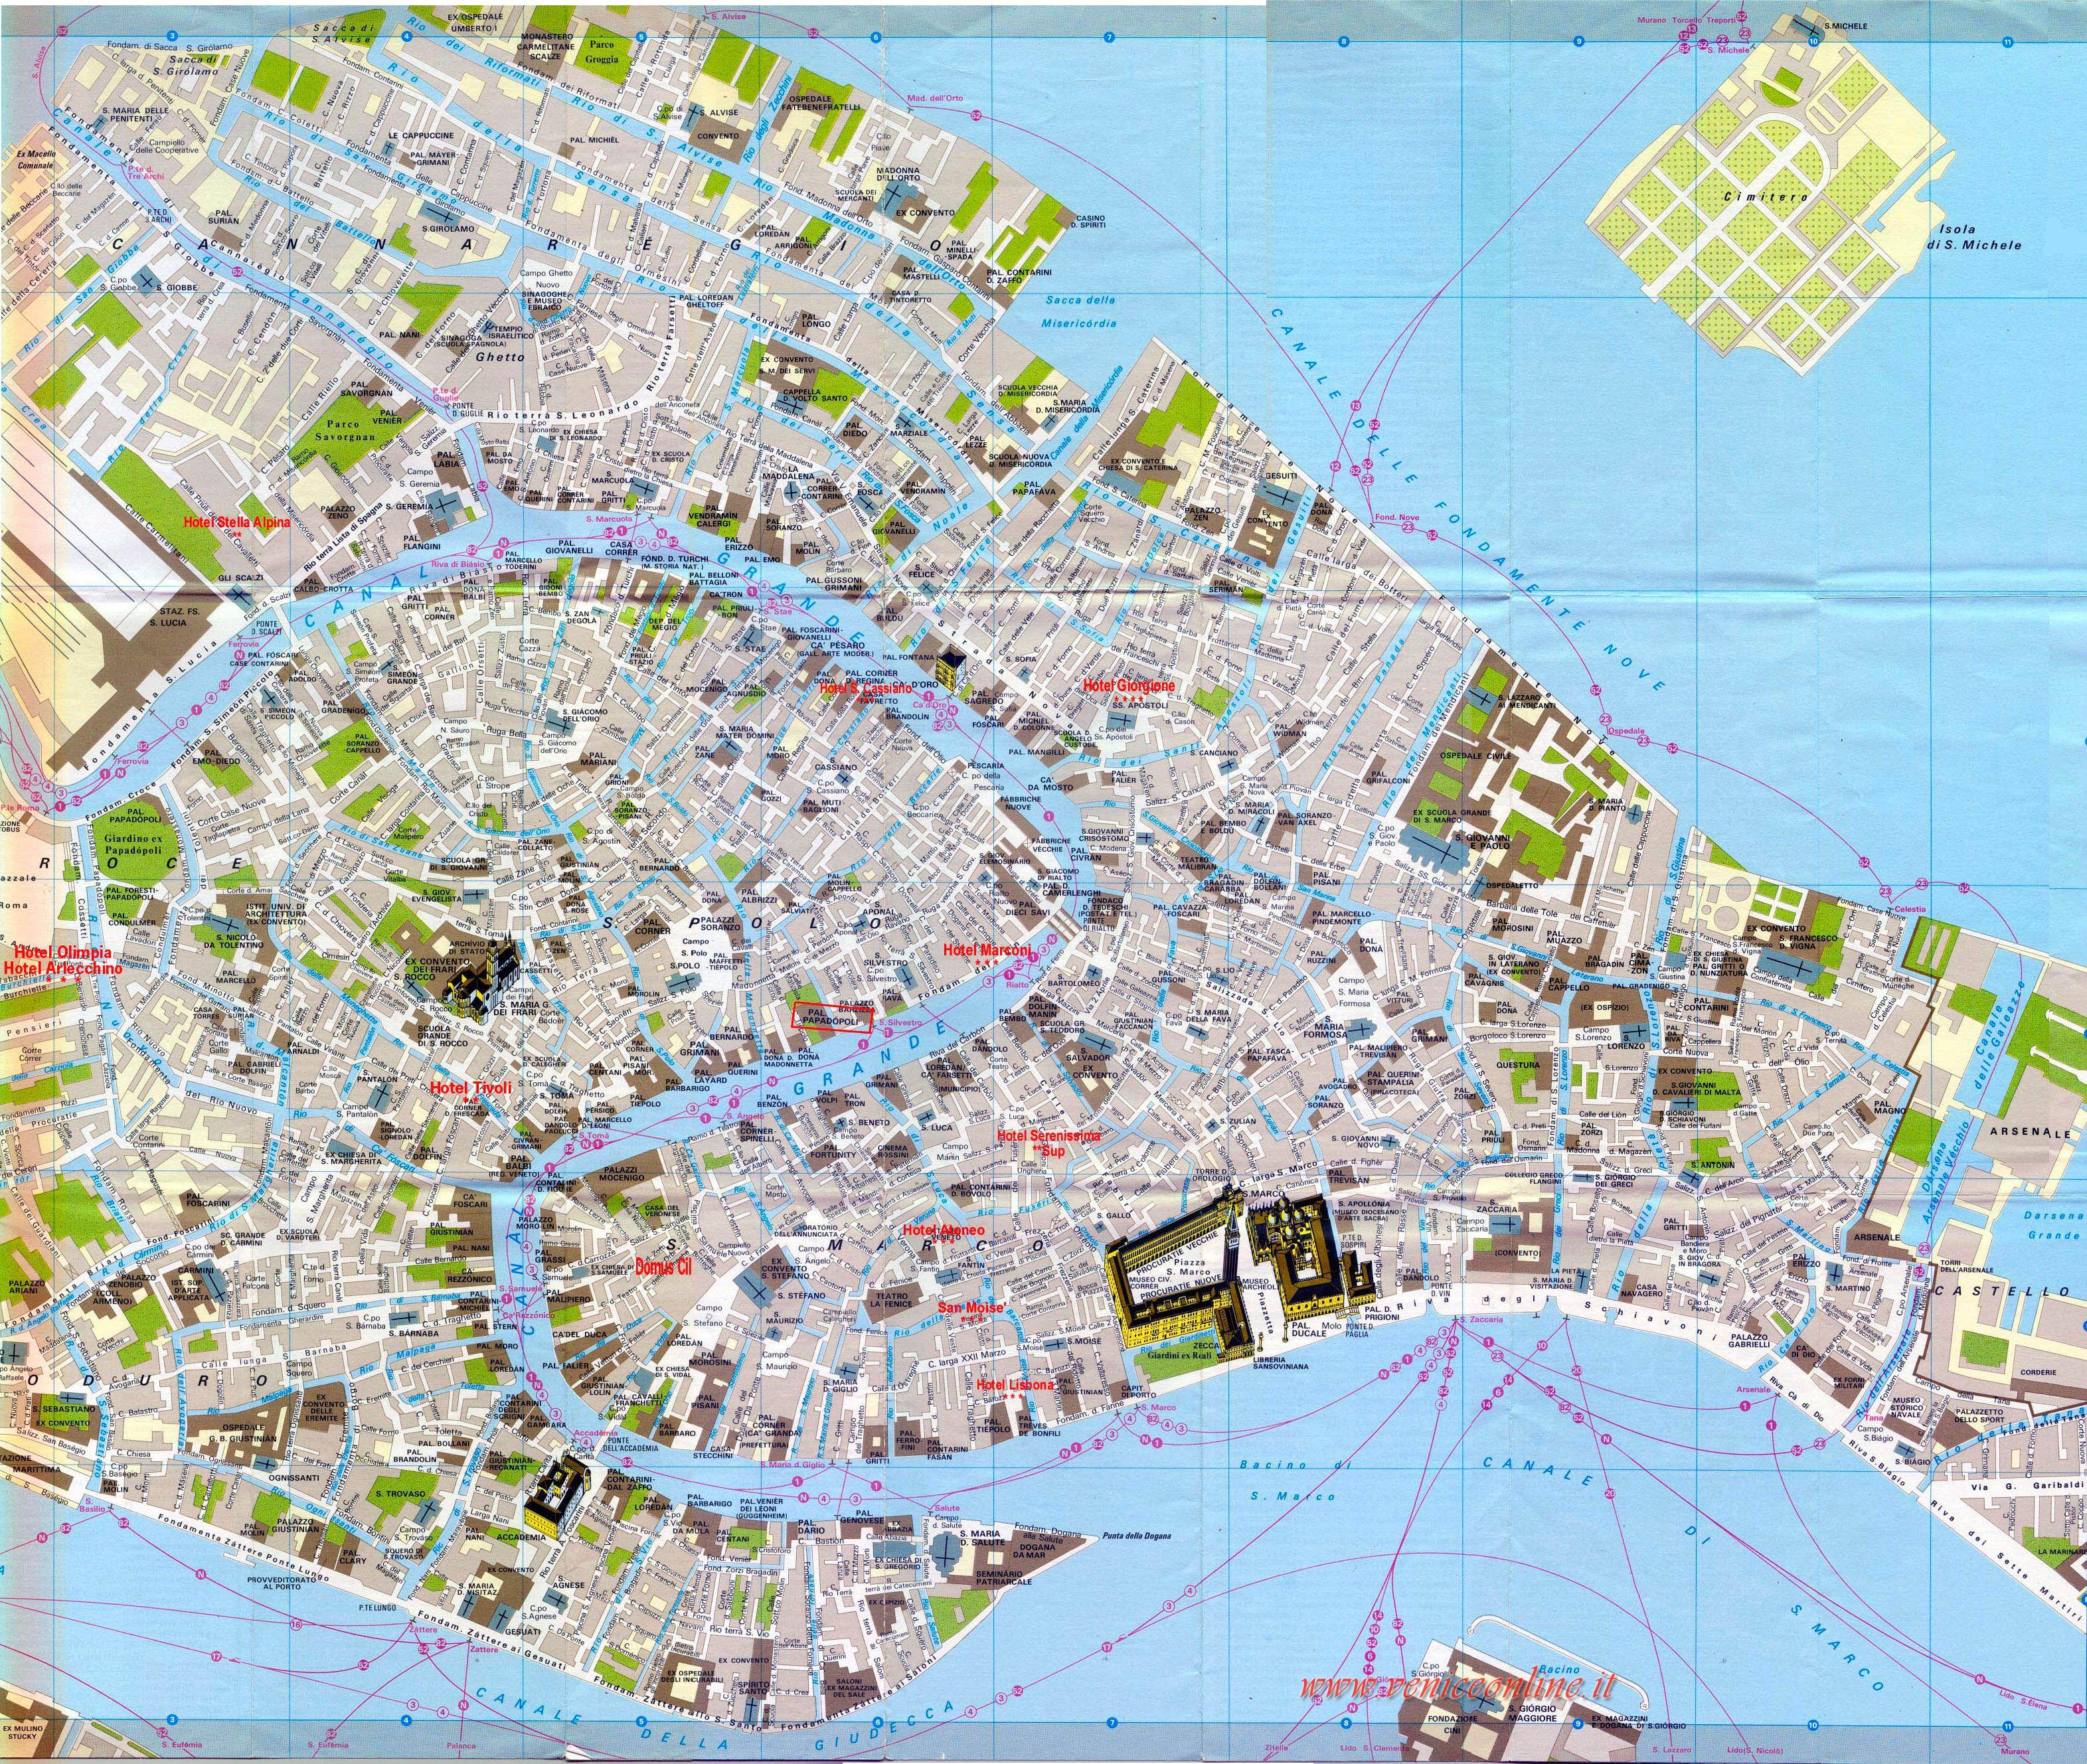 Big Map Of Venice Veniceonline Jpg 3 143 2 657 Pixels Venice Map